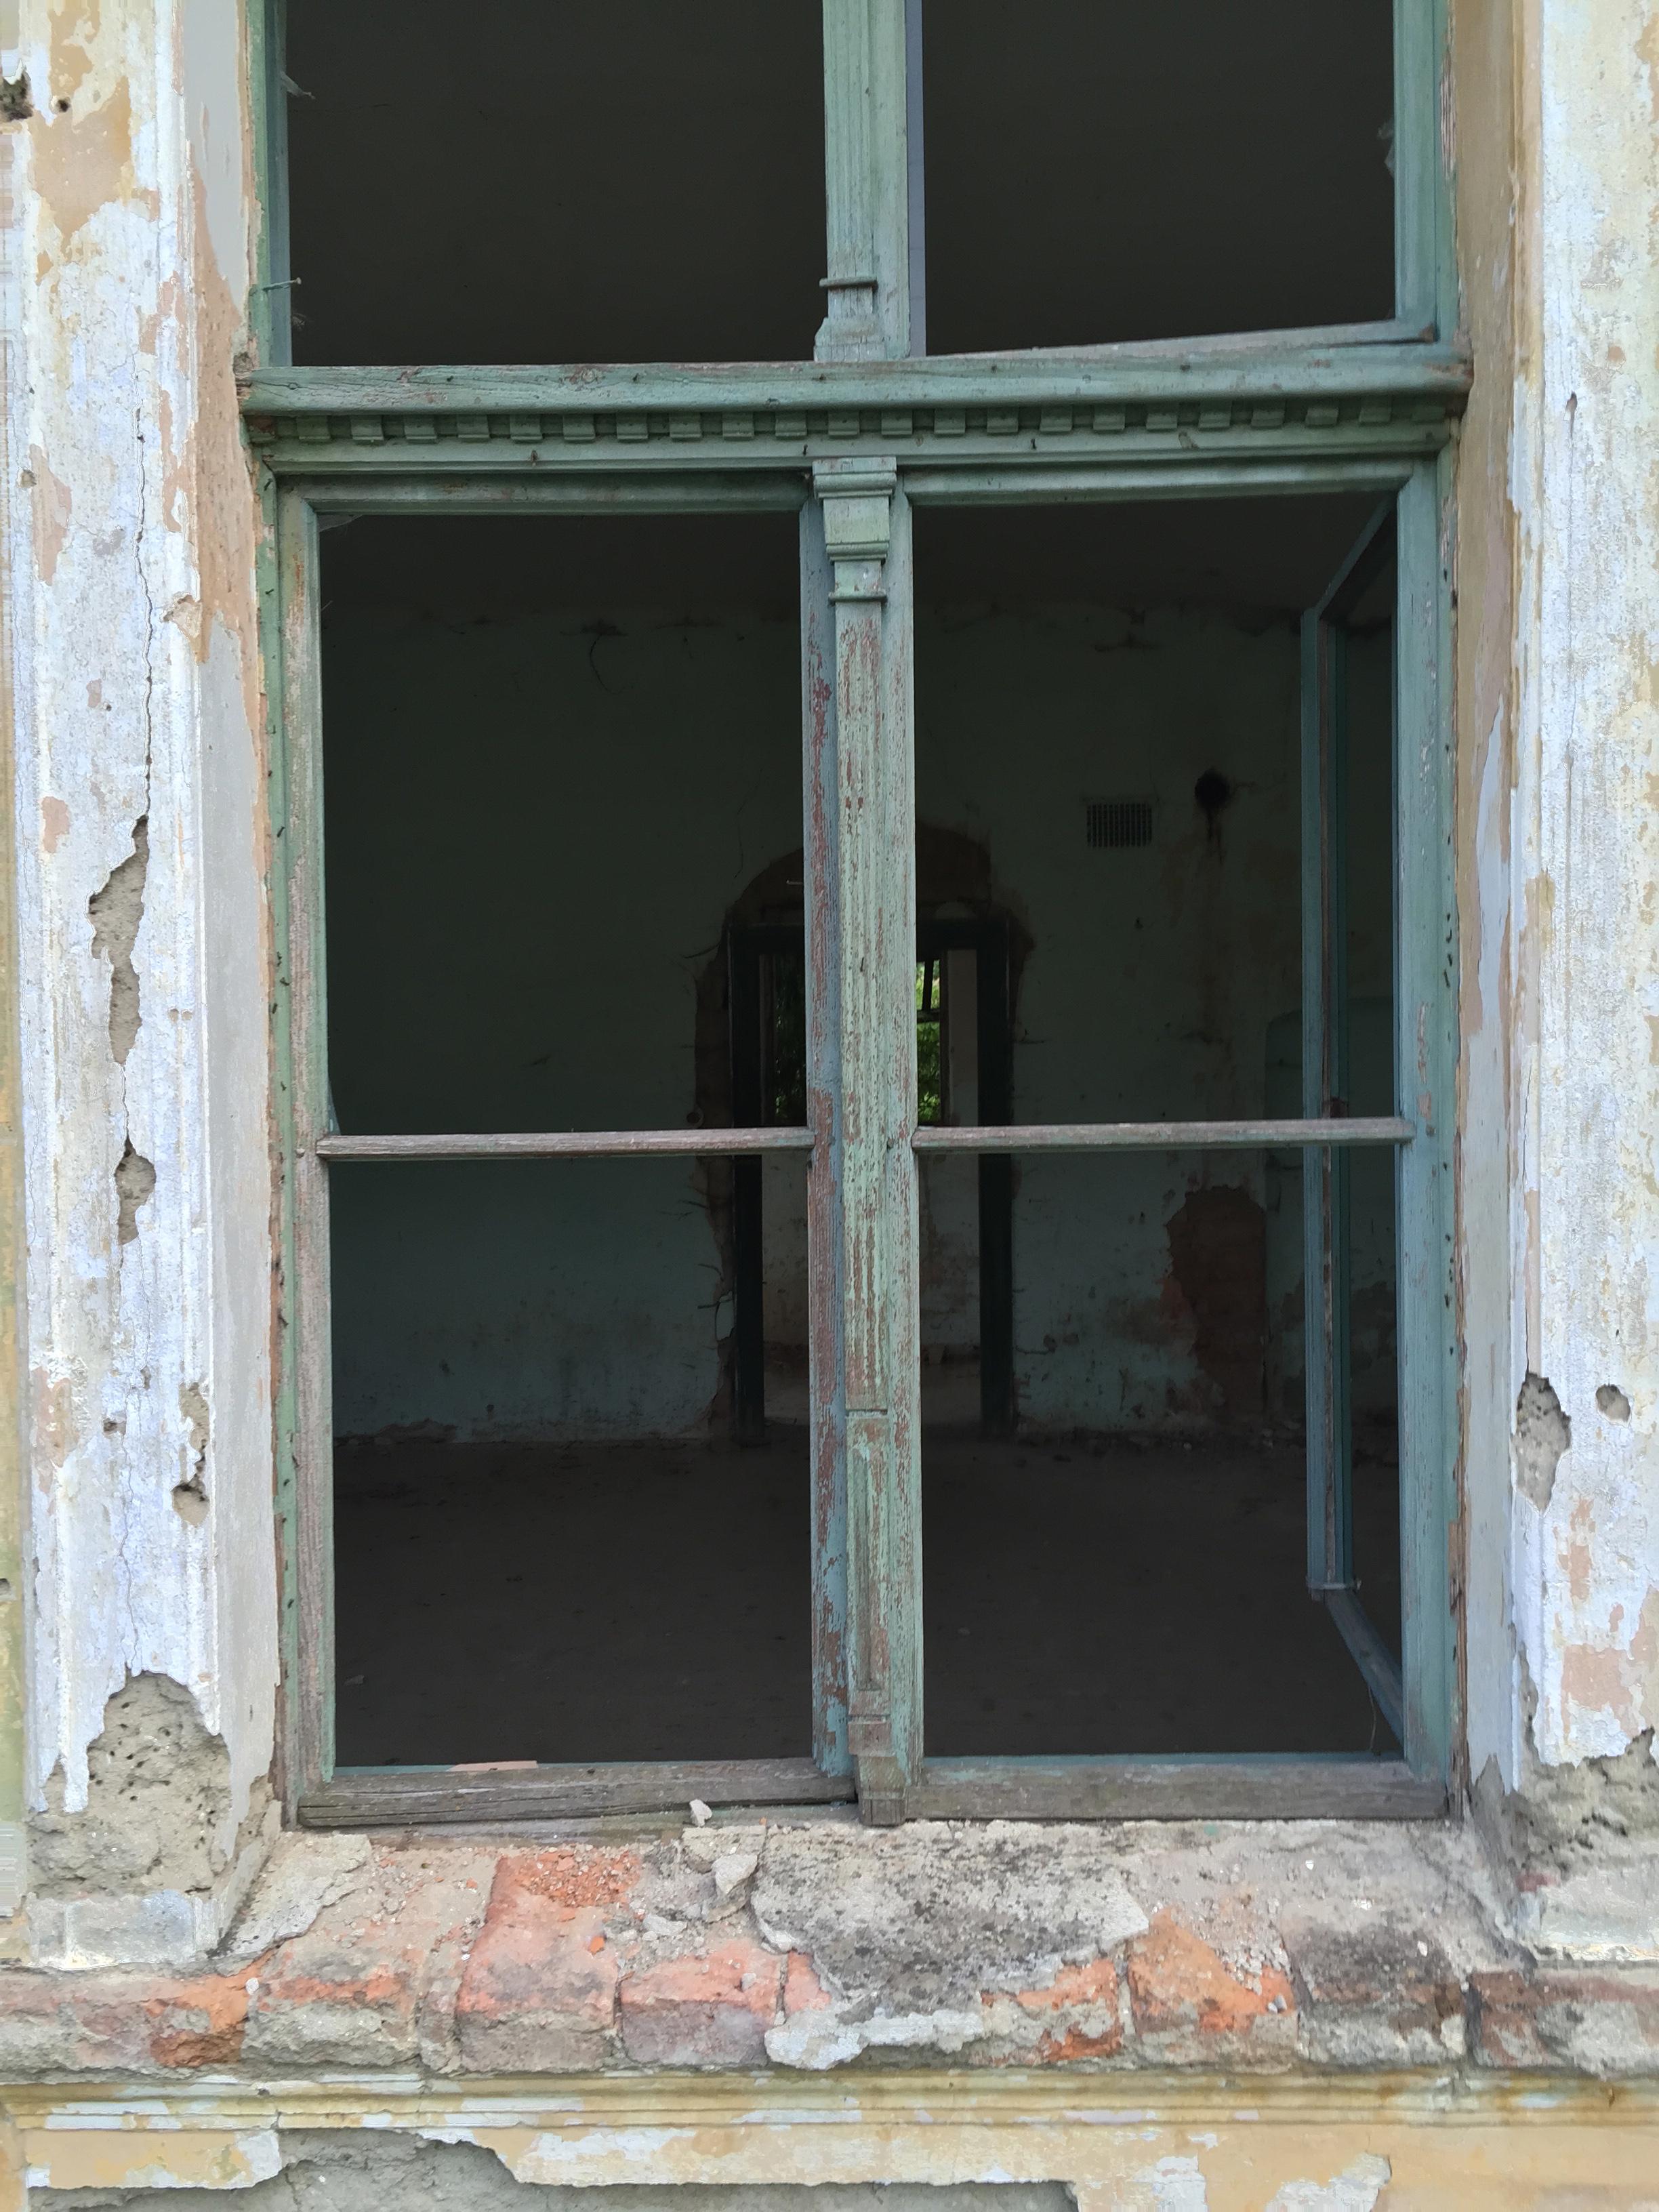 daia school window